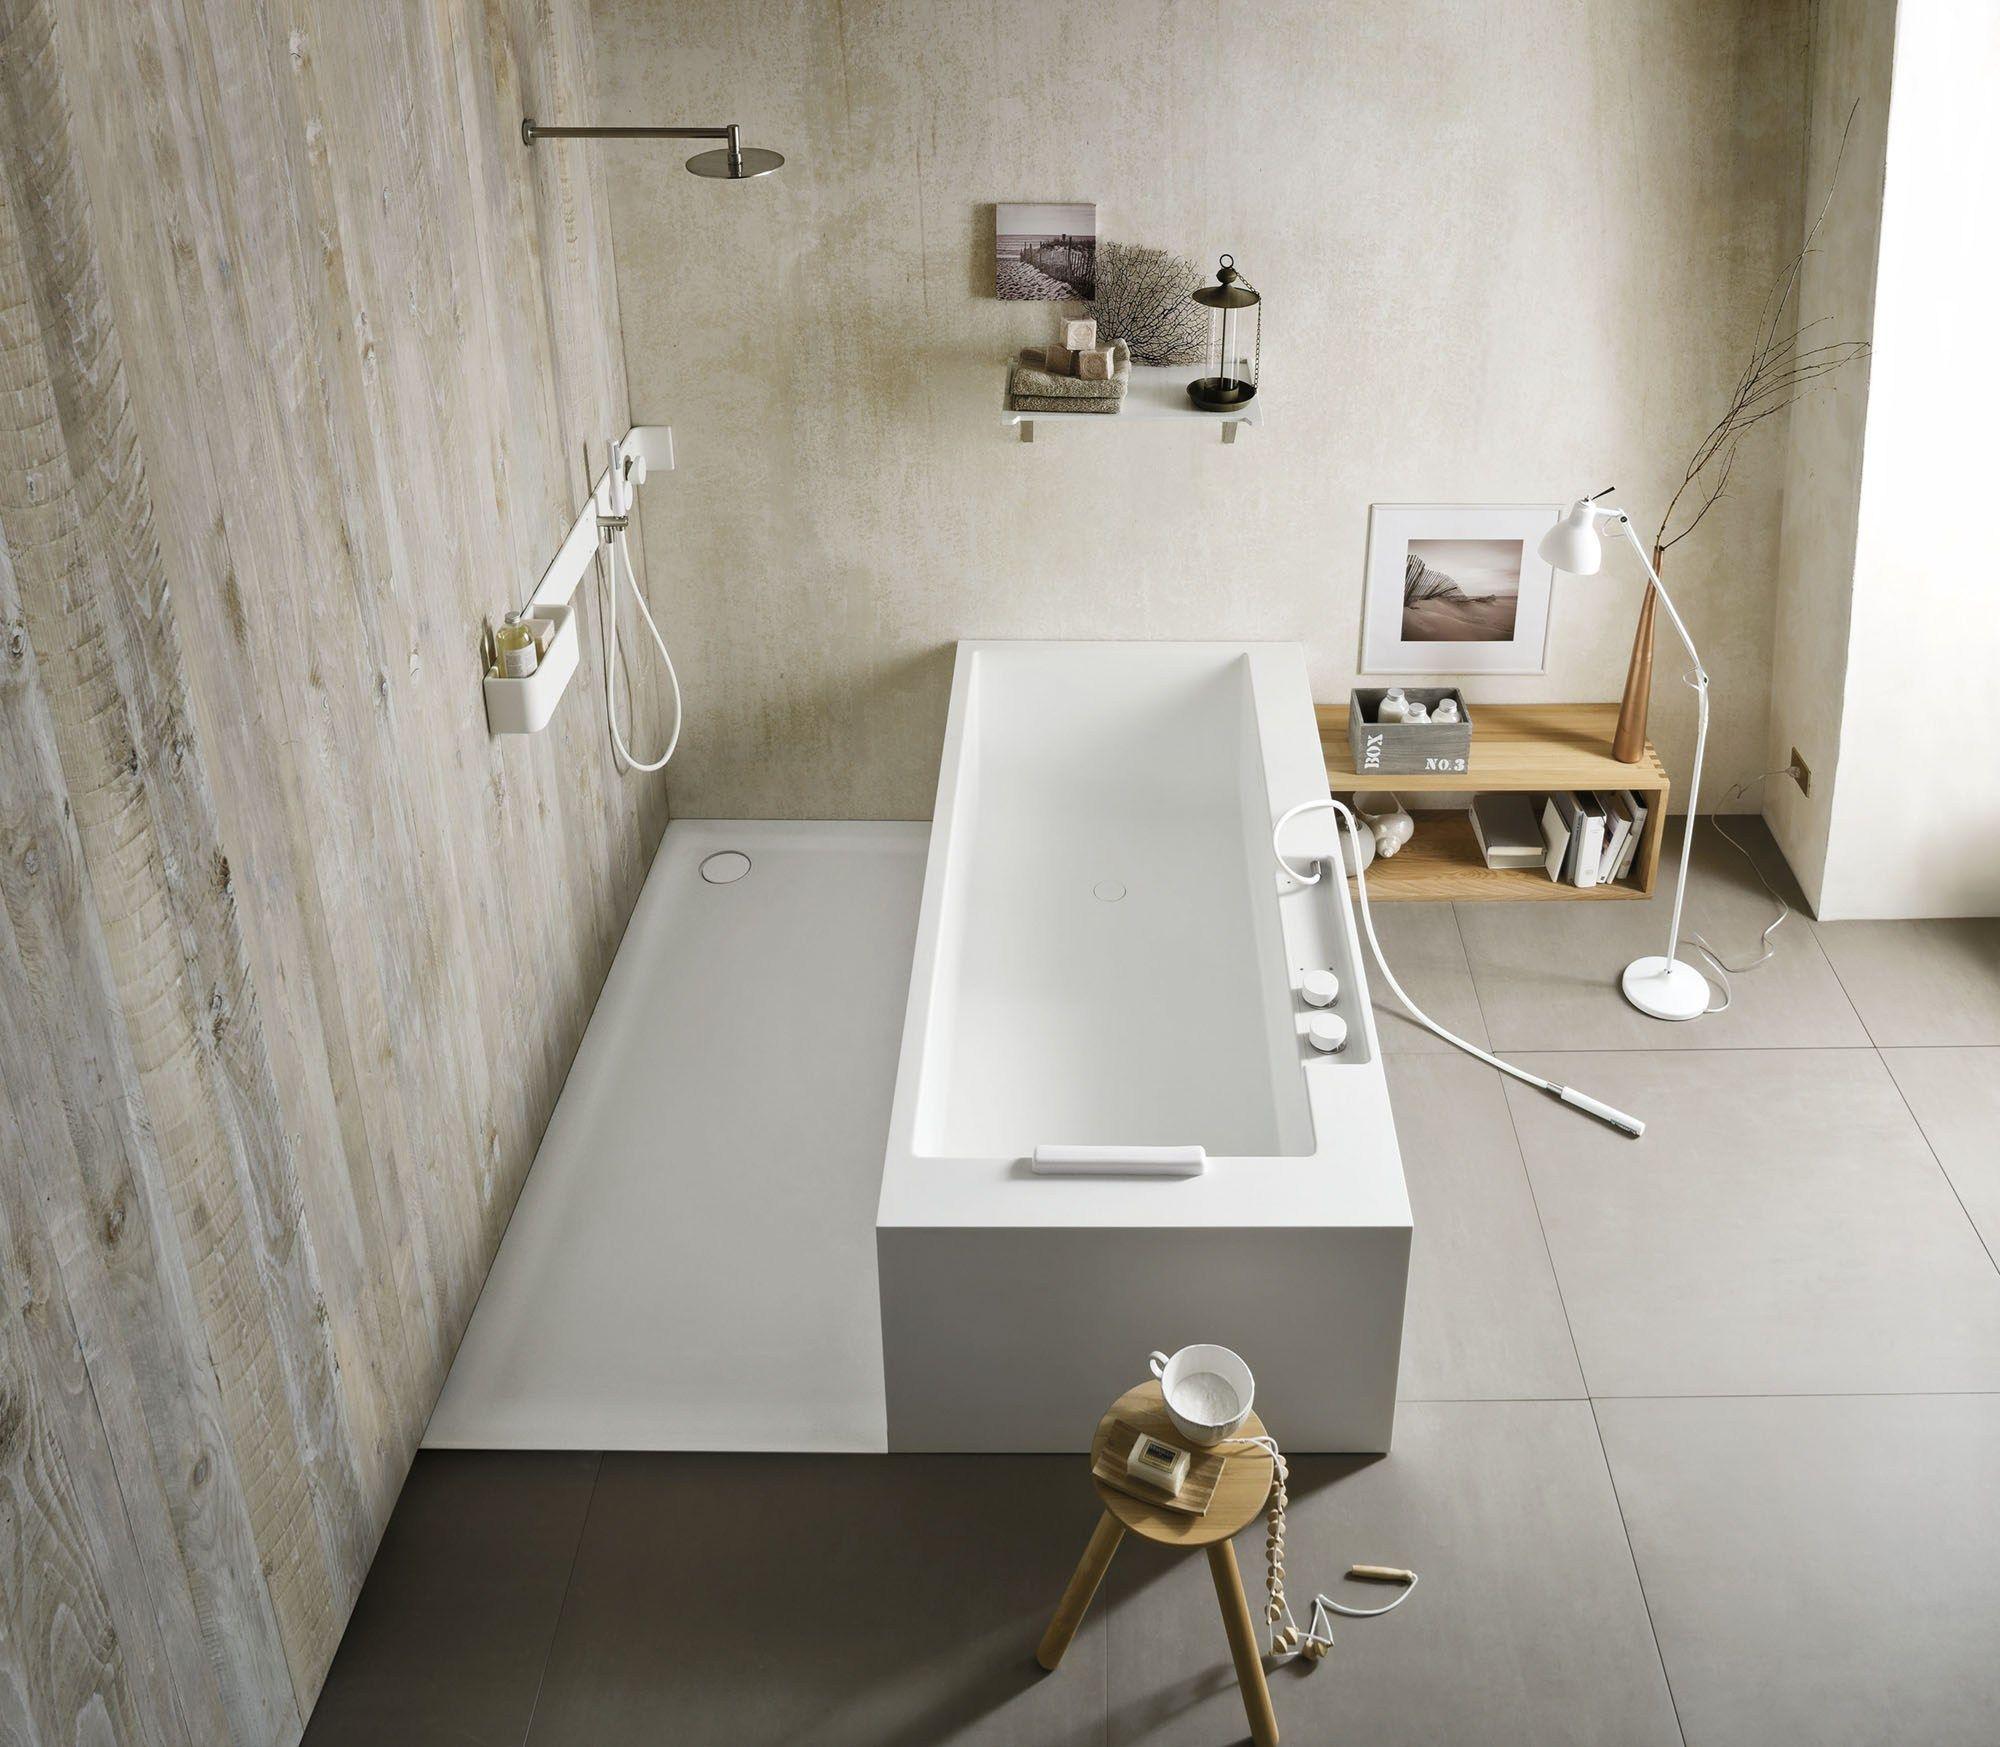 Plato de ducha rectangular de corian de dise o colecci n - Plato ducha corian ...